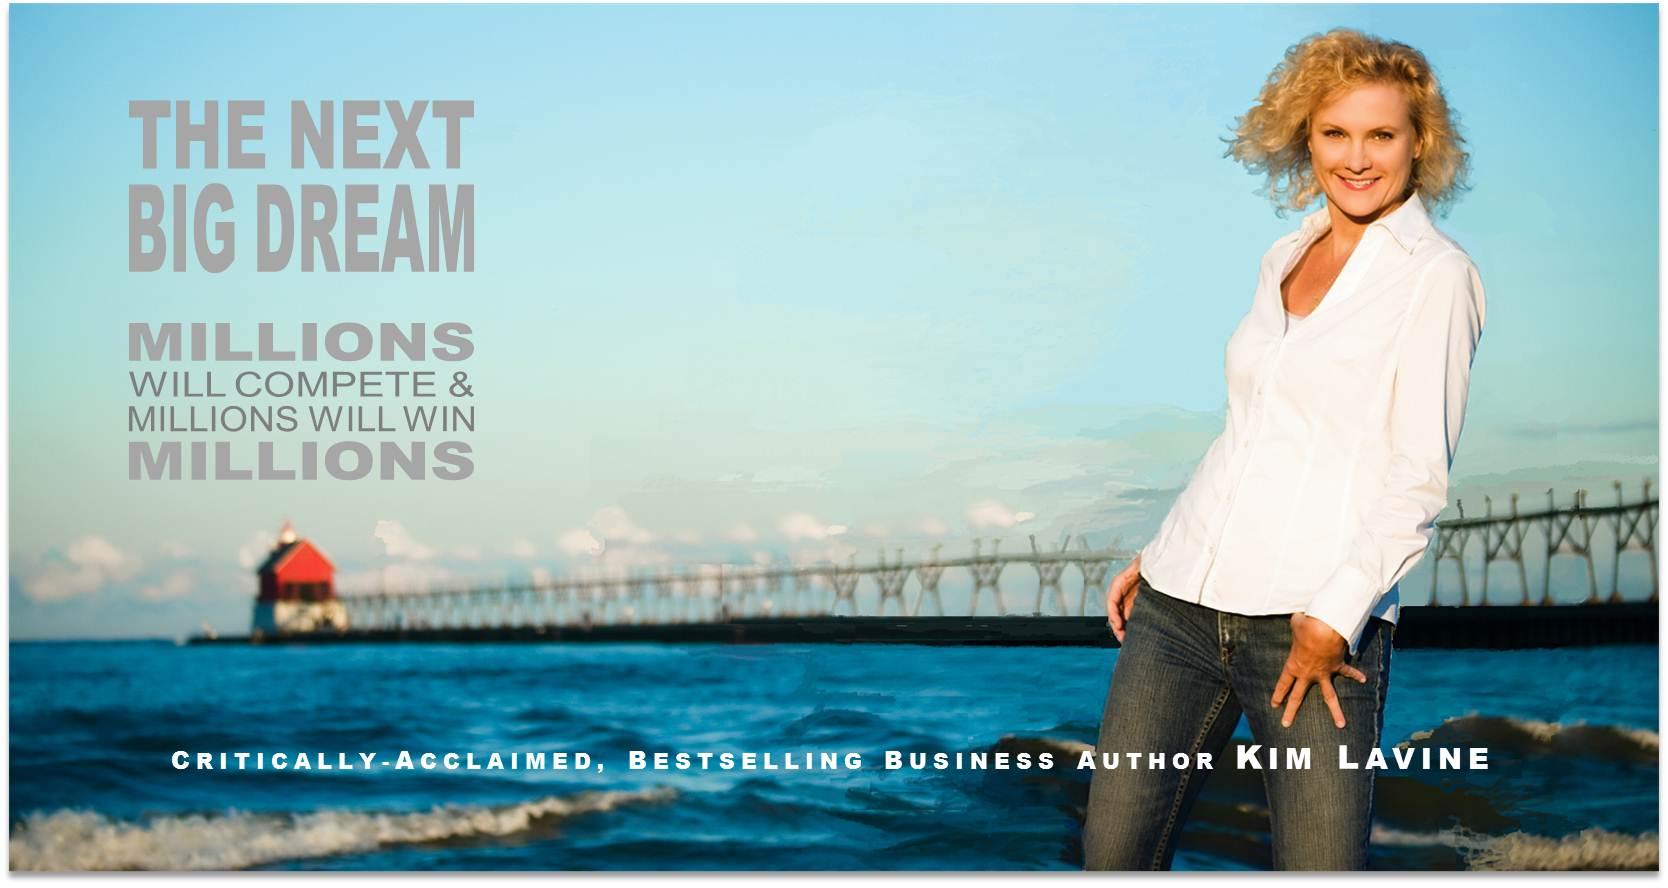 The Next Big Dream - Kim Lavine.jpg